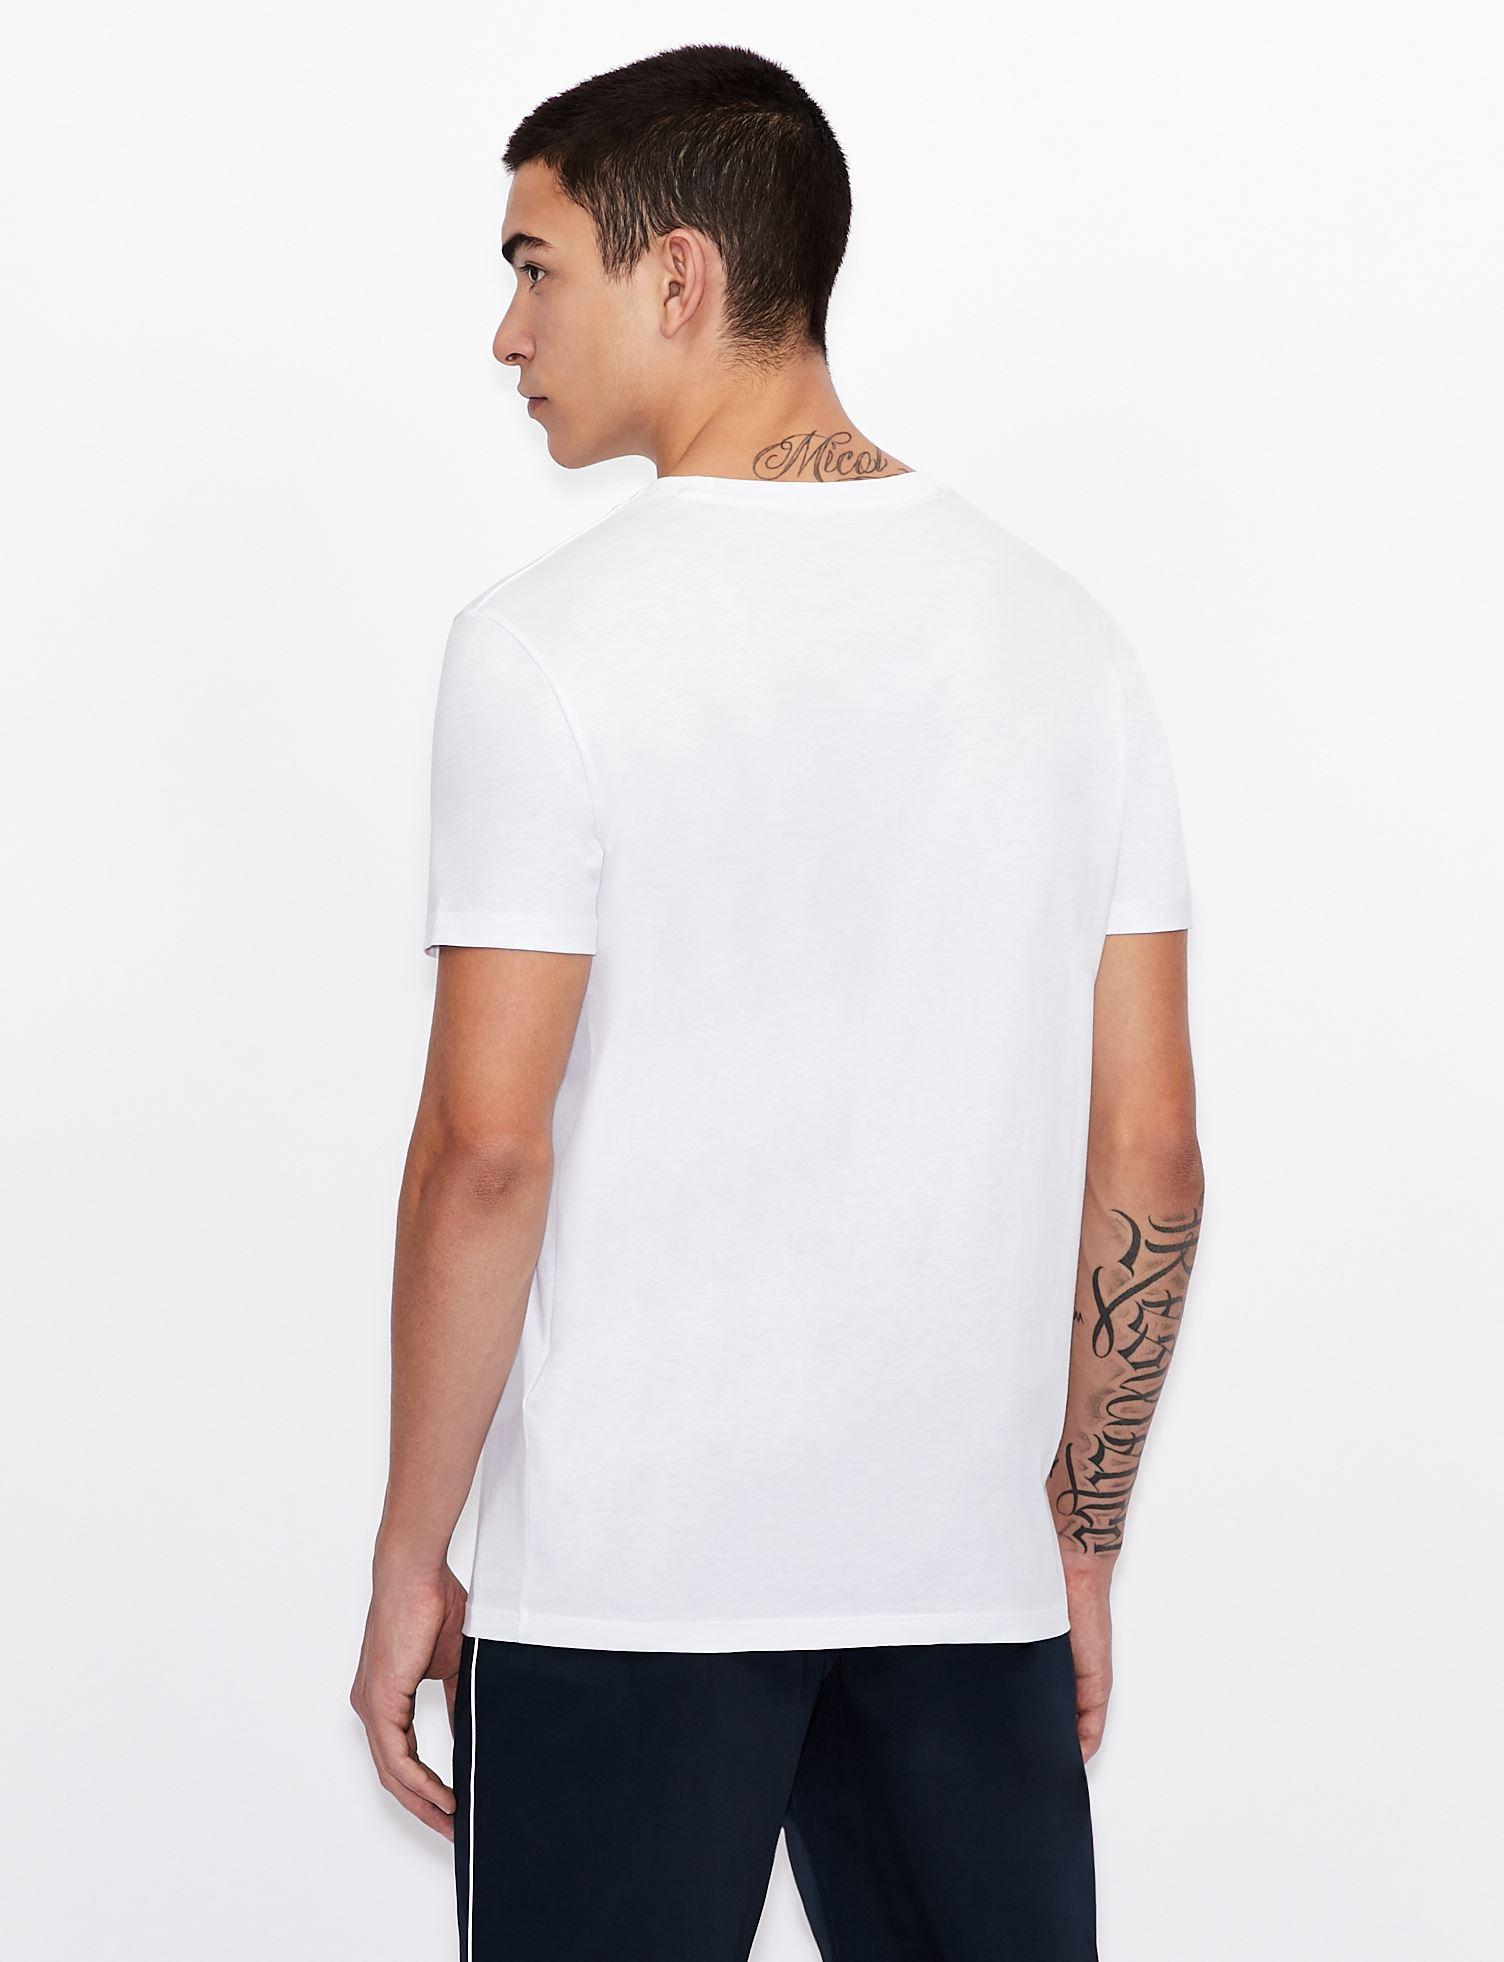 T-shirt Armani Exchange ARMANI EXCHANGE   T-shirt   3KZTAA-ZJA5Z1100